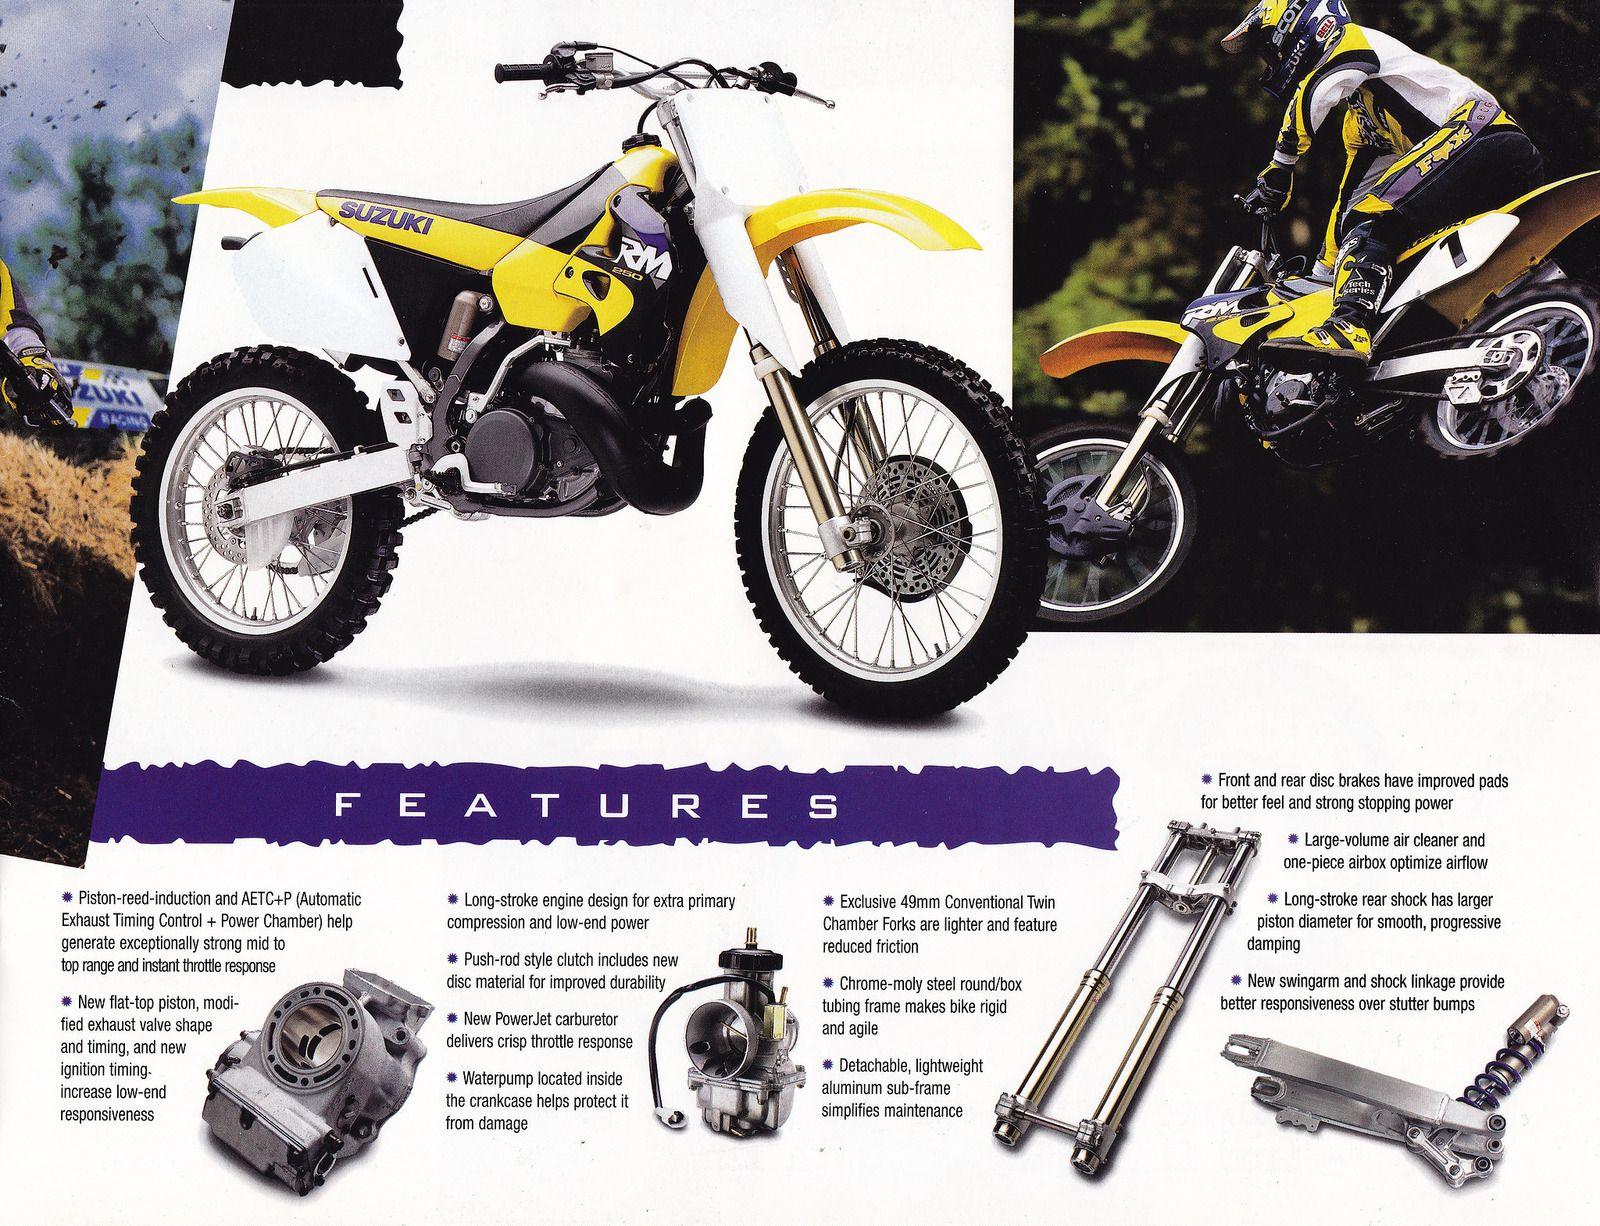 1998 Suzuki RM and RMX Brochure Page 3 | Vintage dirt bikes | Dirt ...